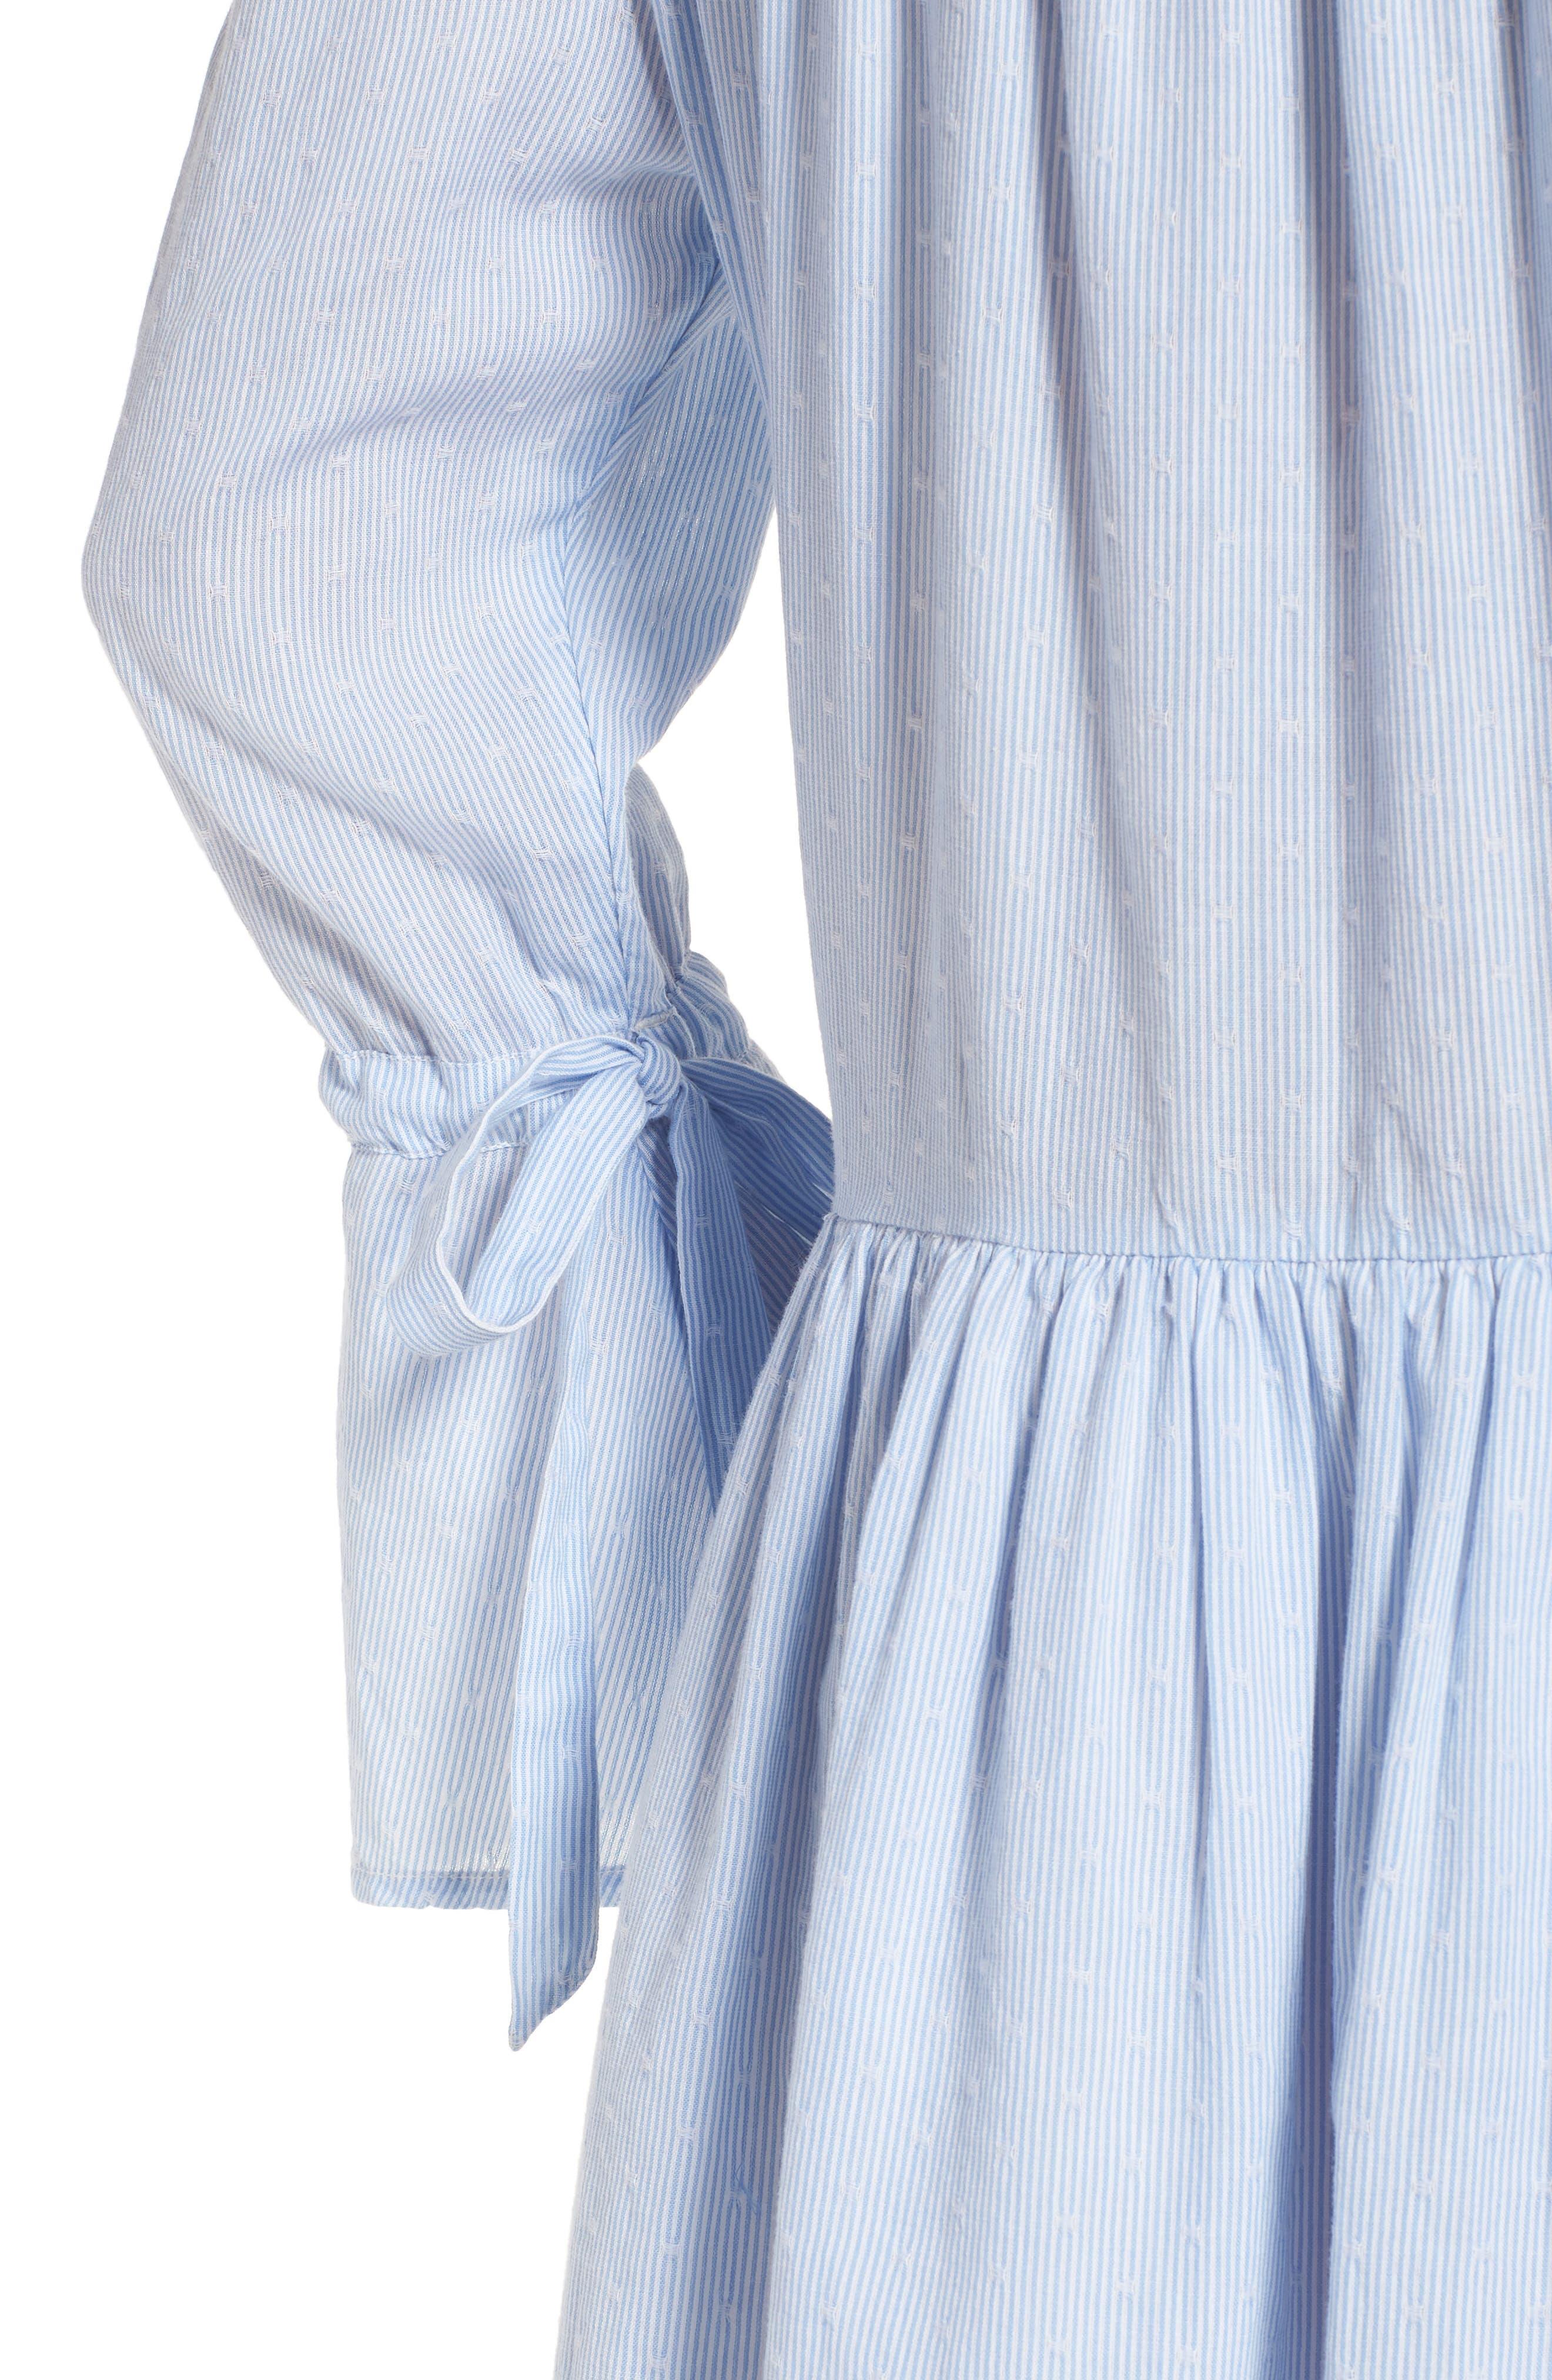 Pinstripe Eyelet Trim Cotton Shirtdress,                             Alternate thumbnail 4, color,                             Blue- White Stripe